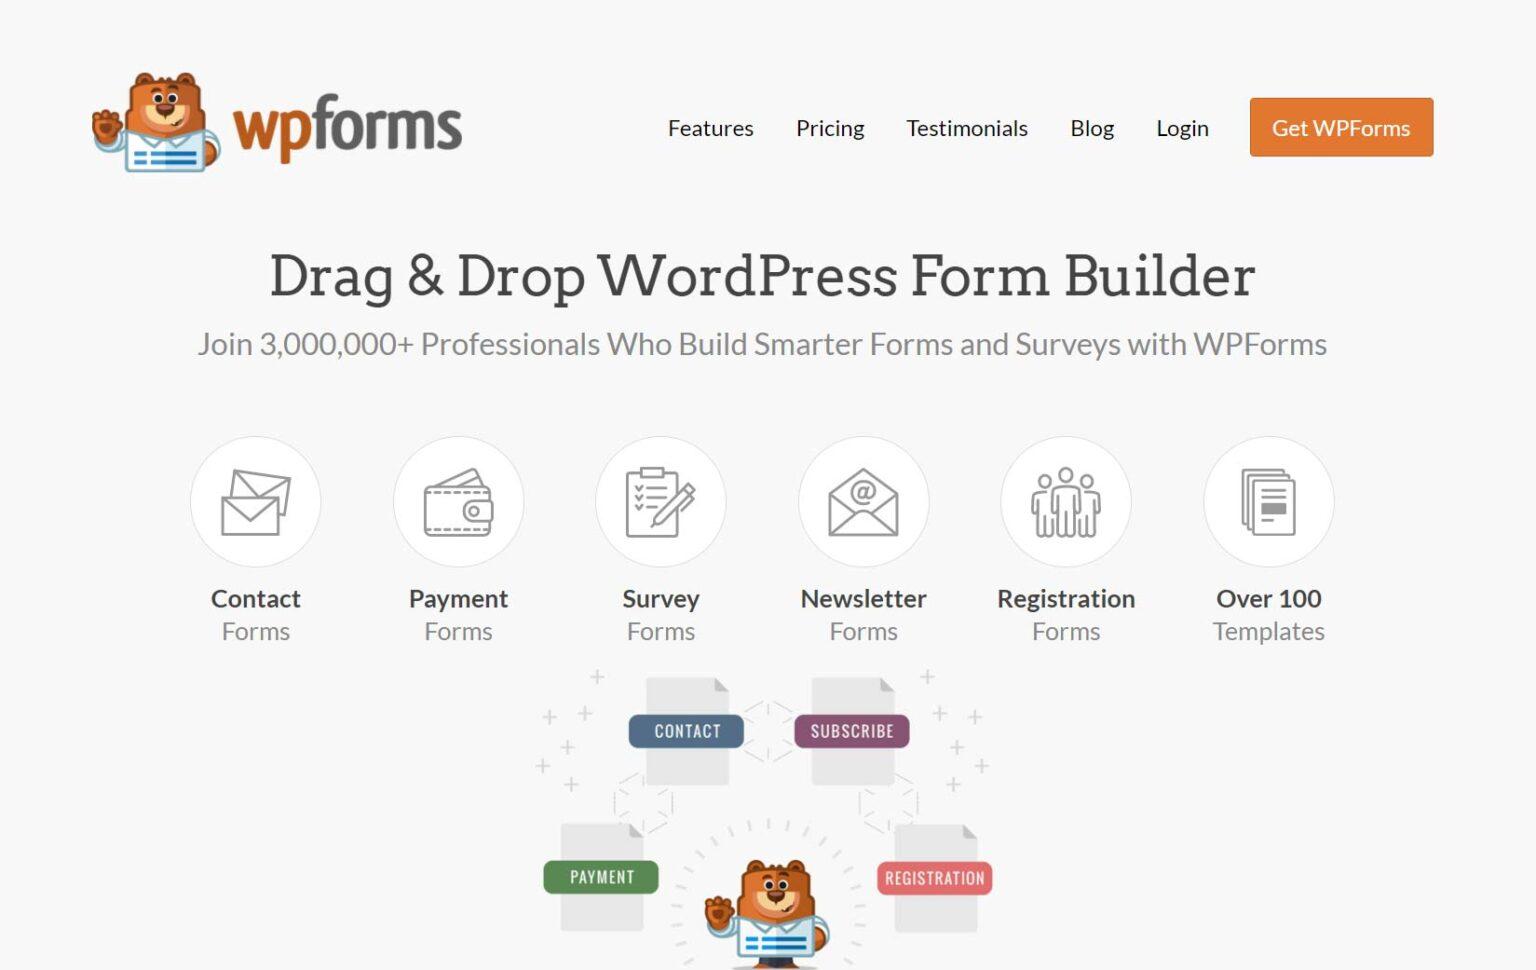 Drag and drop WordPress form builder - WPForms